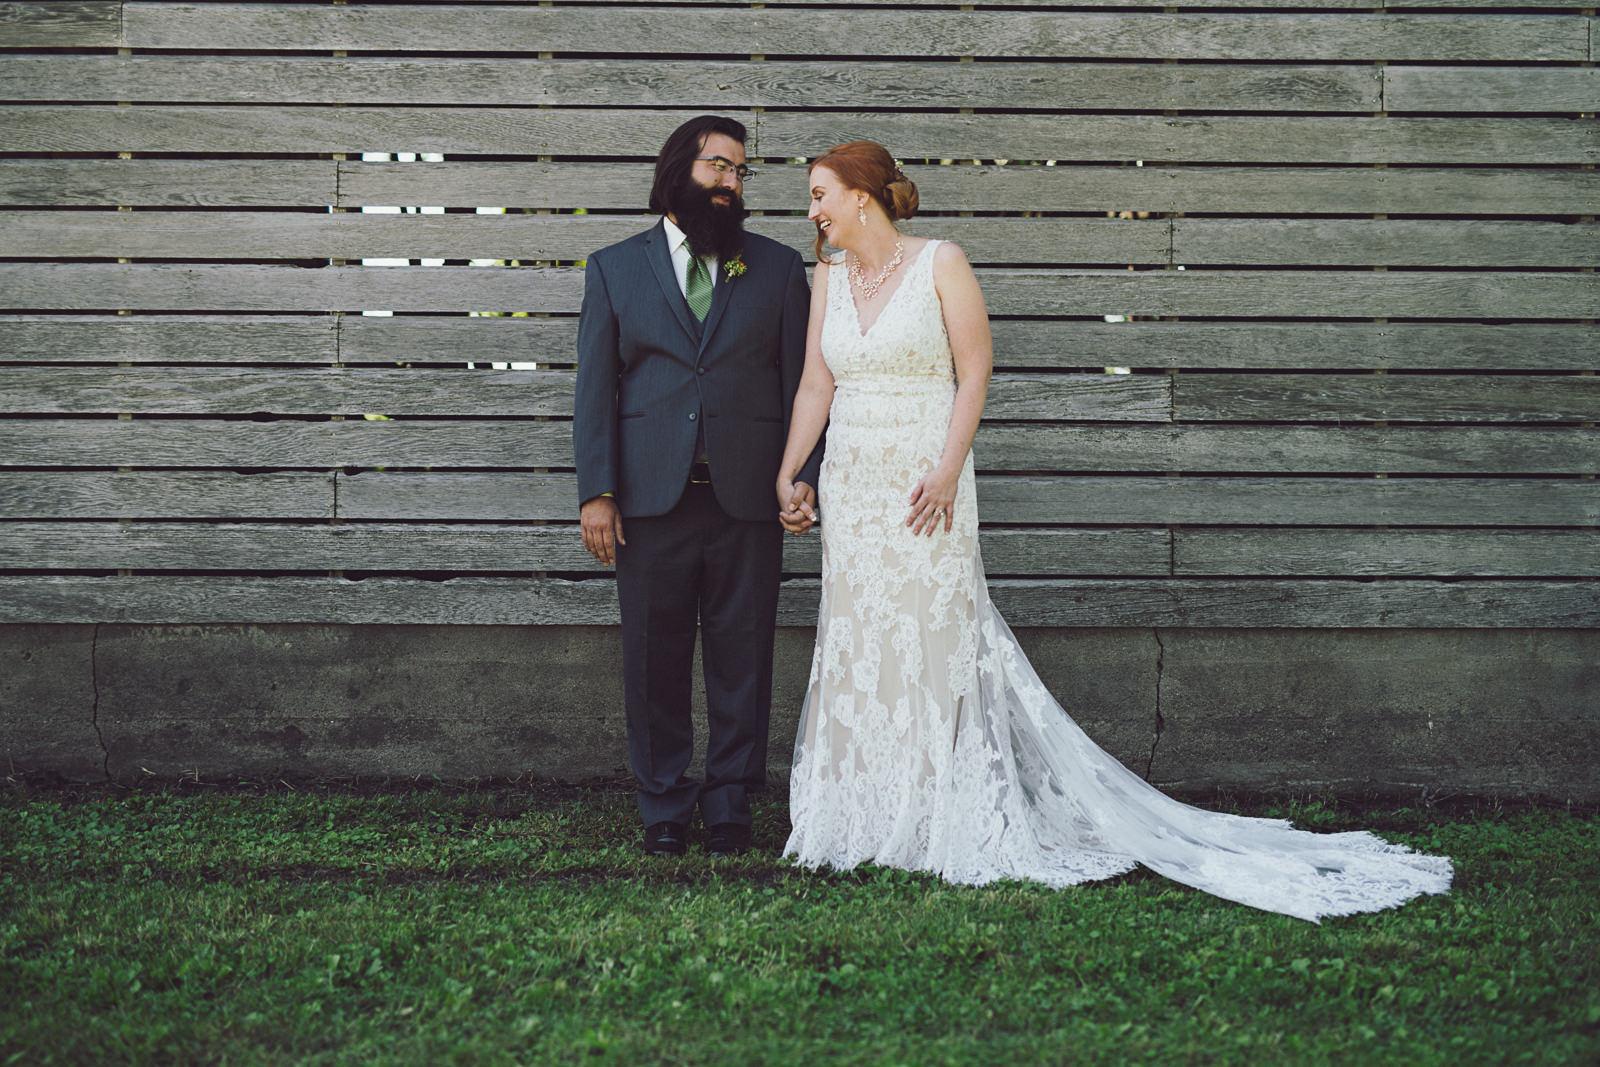 wedding-keely-caleb-378-name-your-photo.jpg